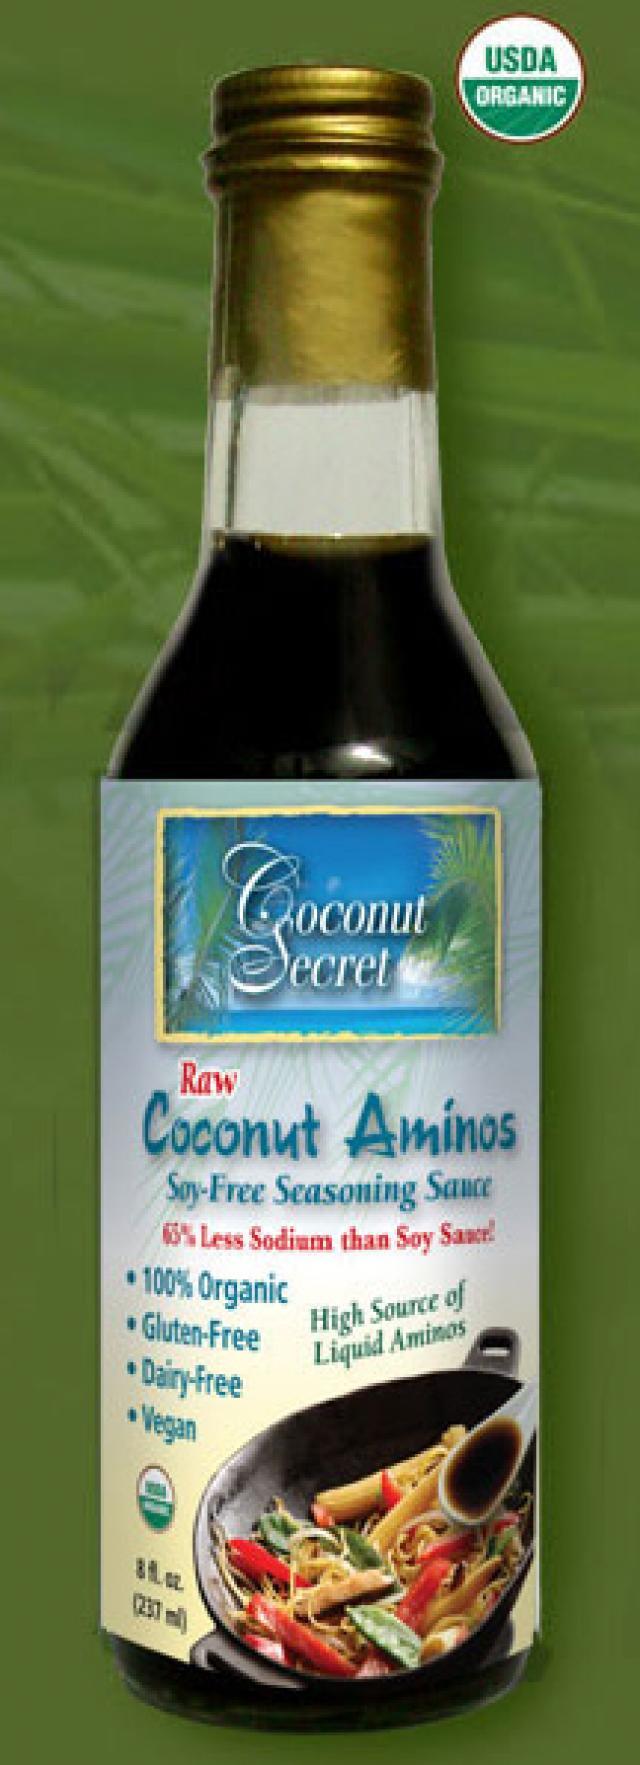 Recipes with coconut aminos